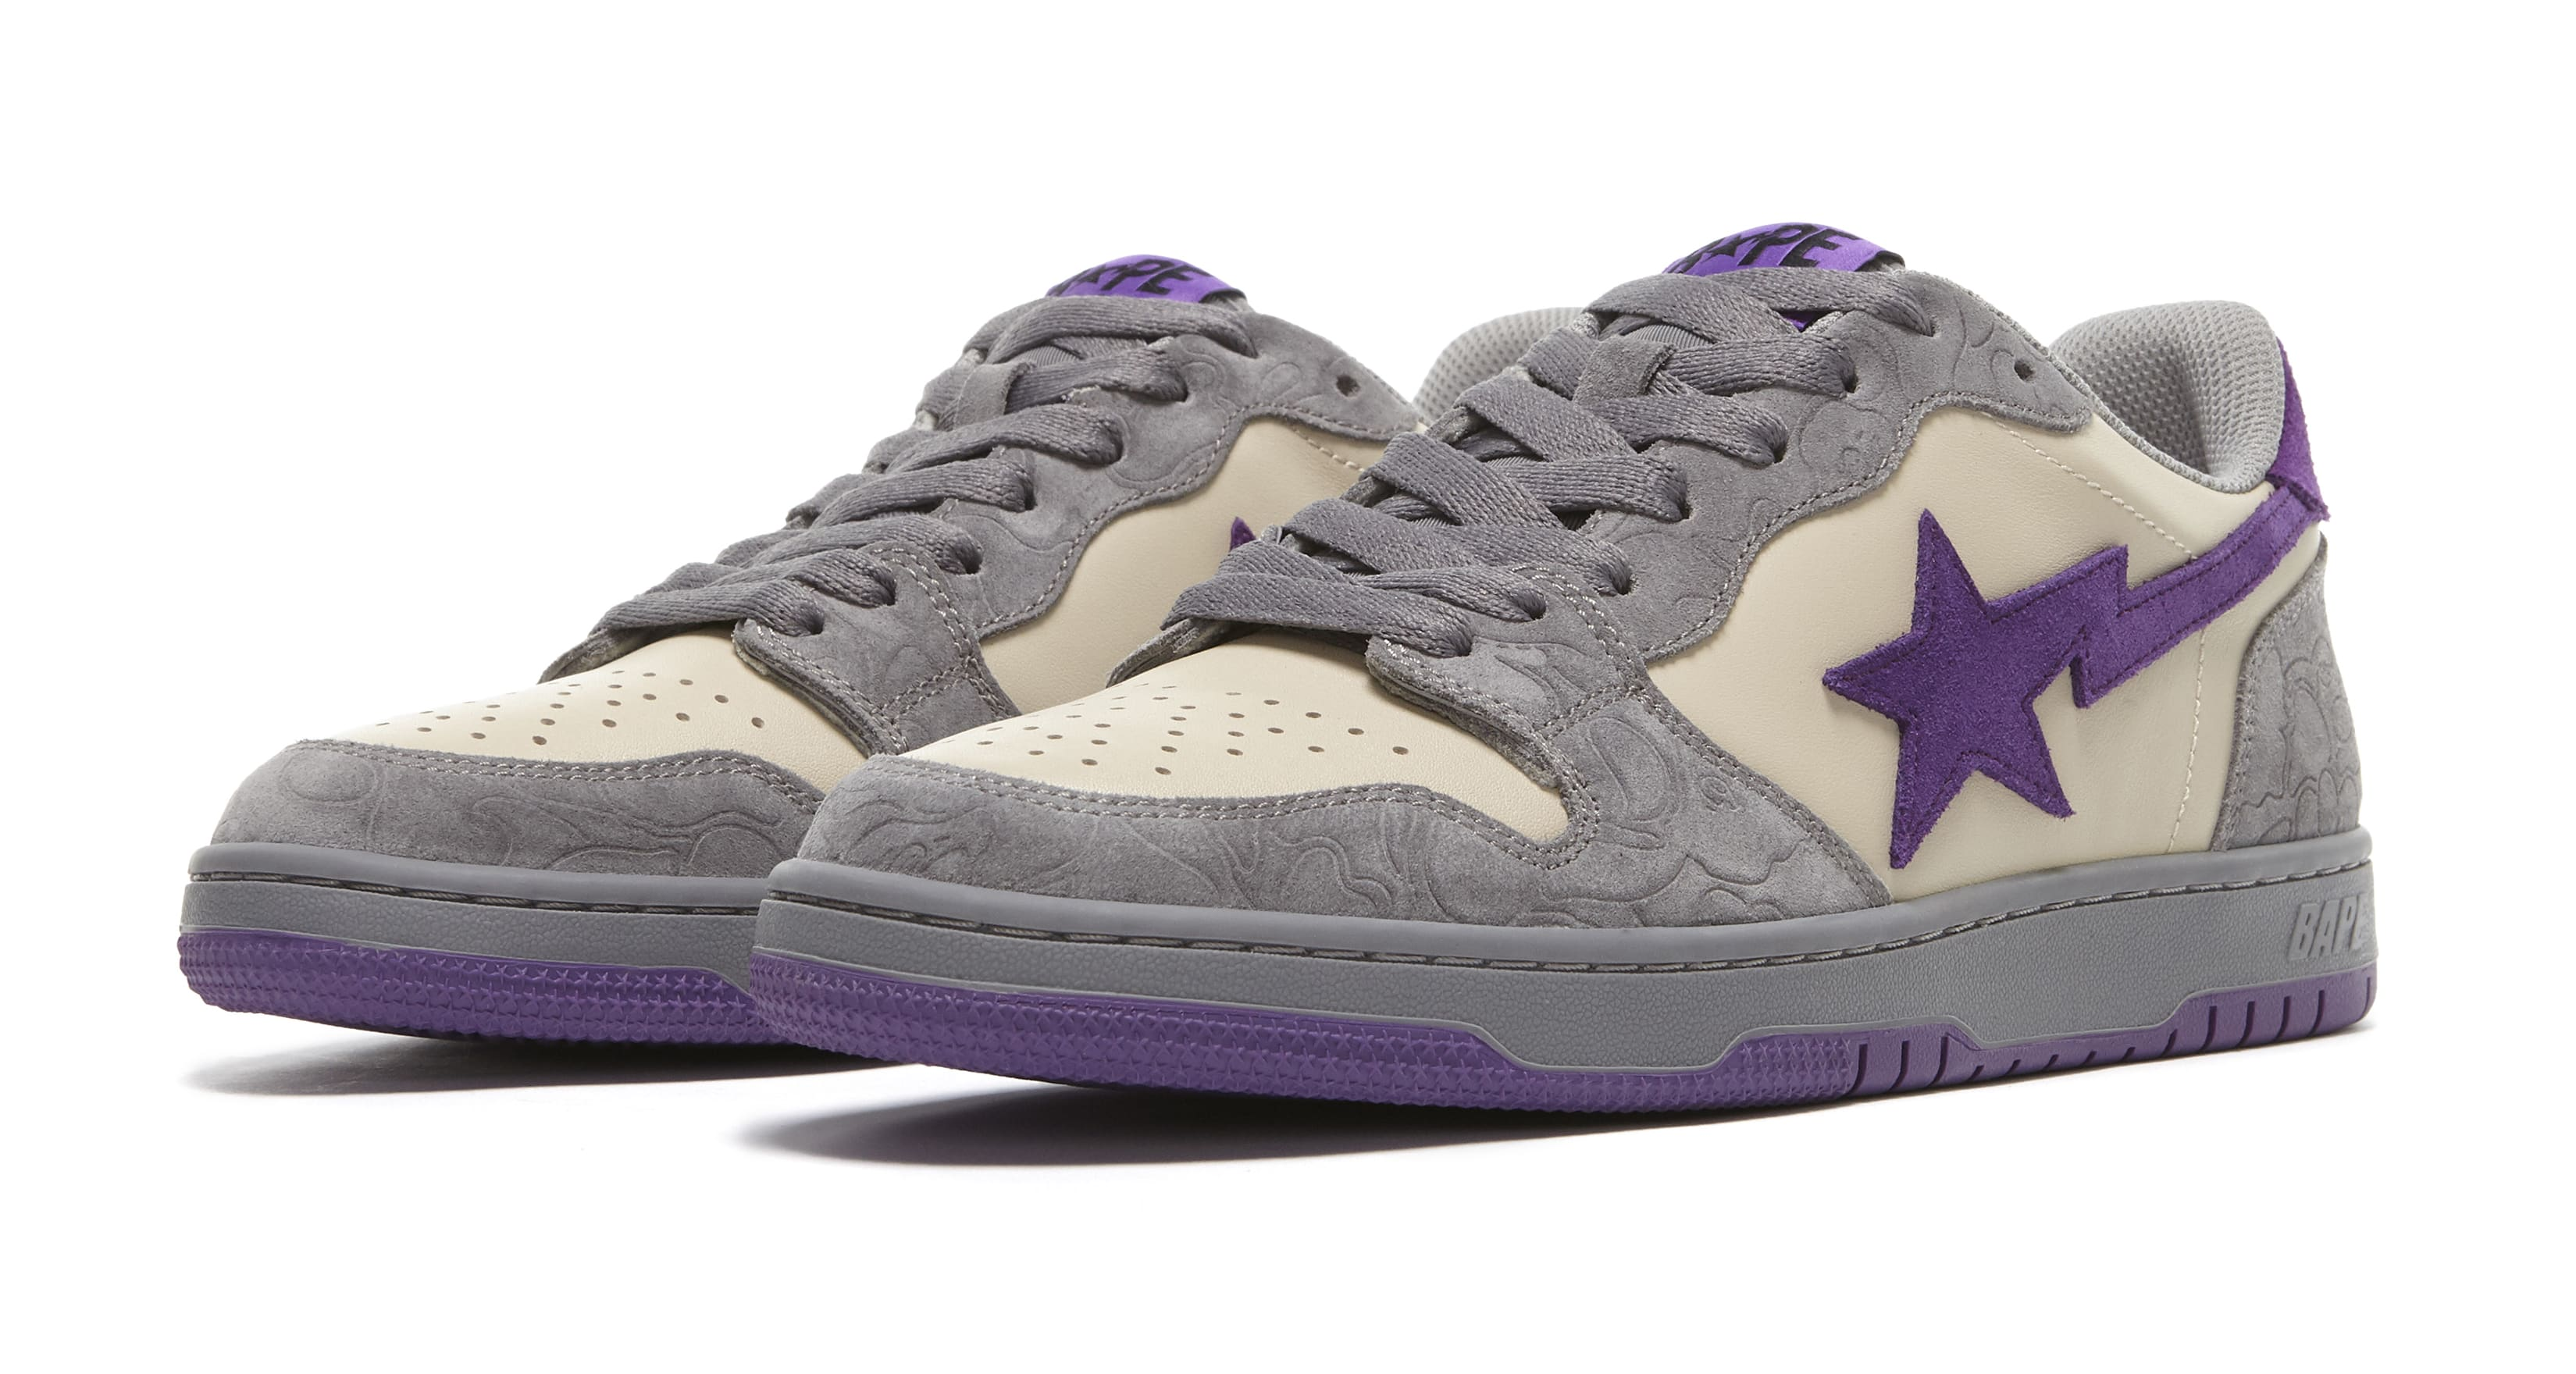 Bape Court Sta Mist Grey and Royal Purple Pair